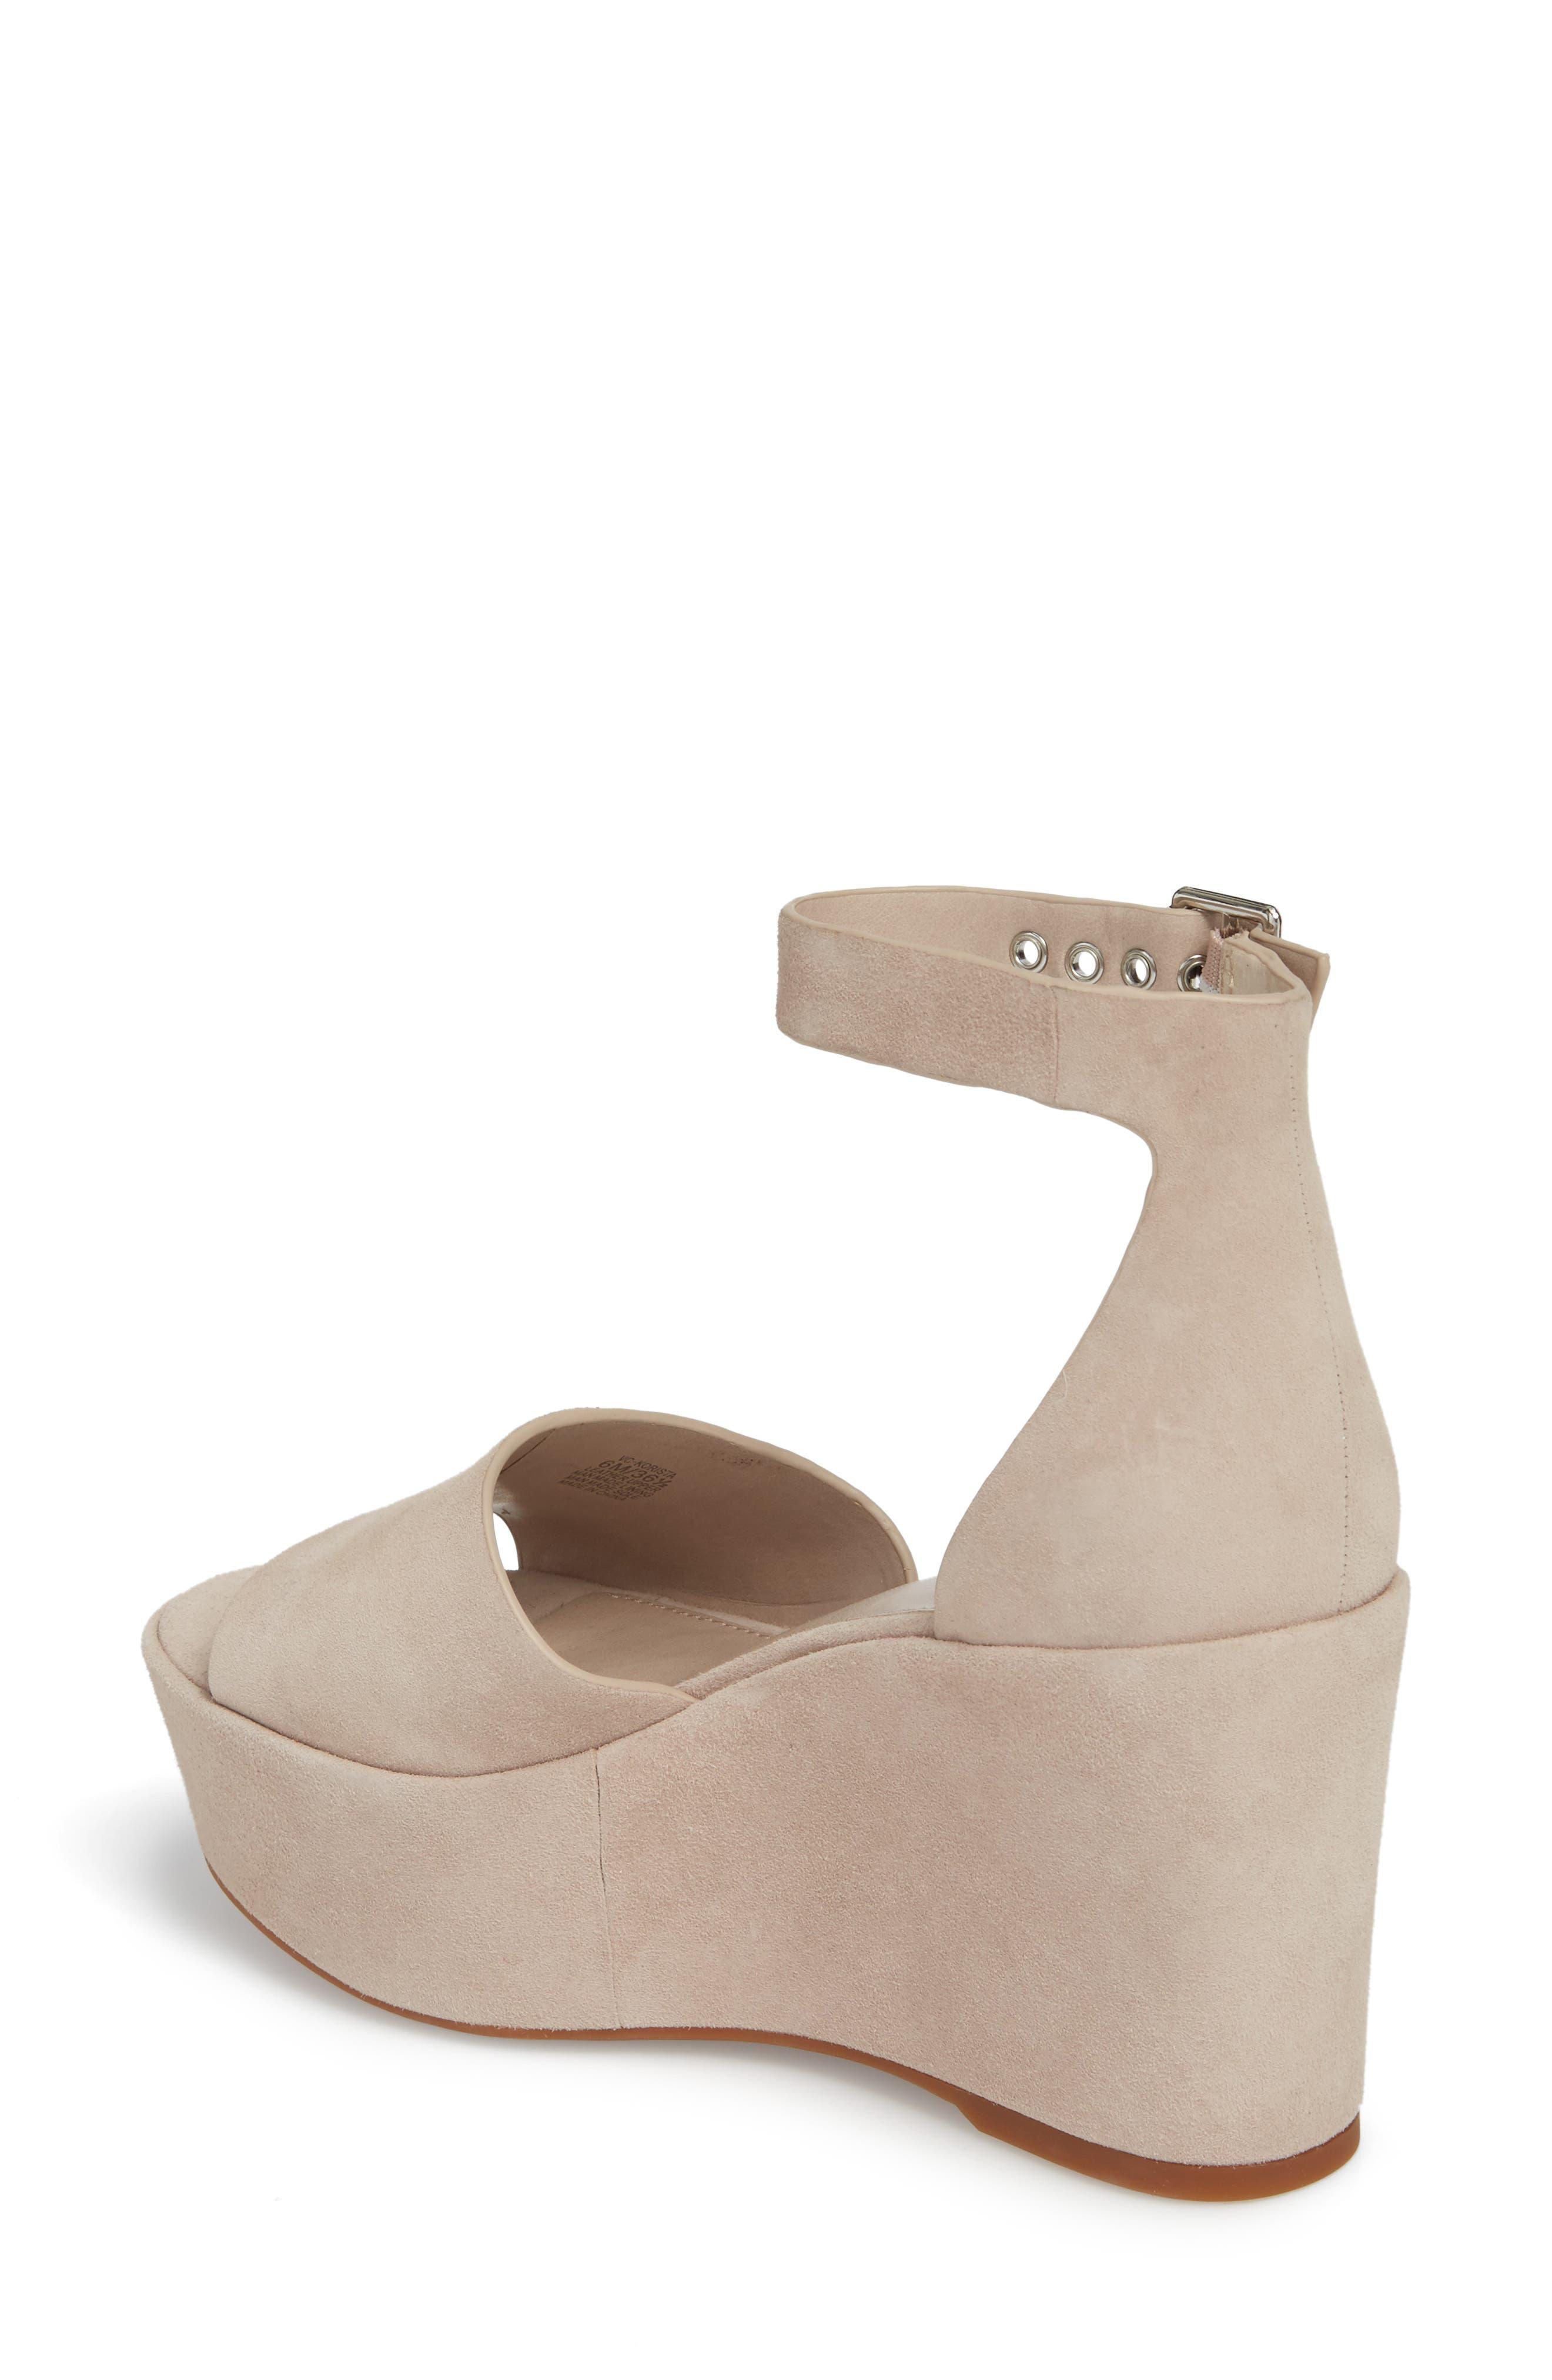 Korista Platform Sandal,                             Alternate thumbnail 2, color,                             Tipsy Taupe Suede